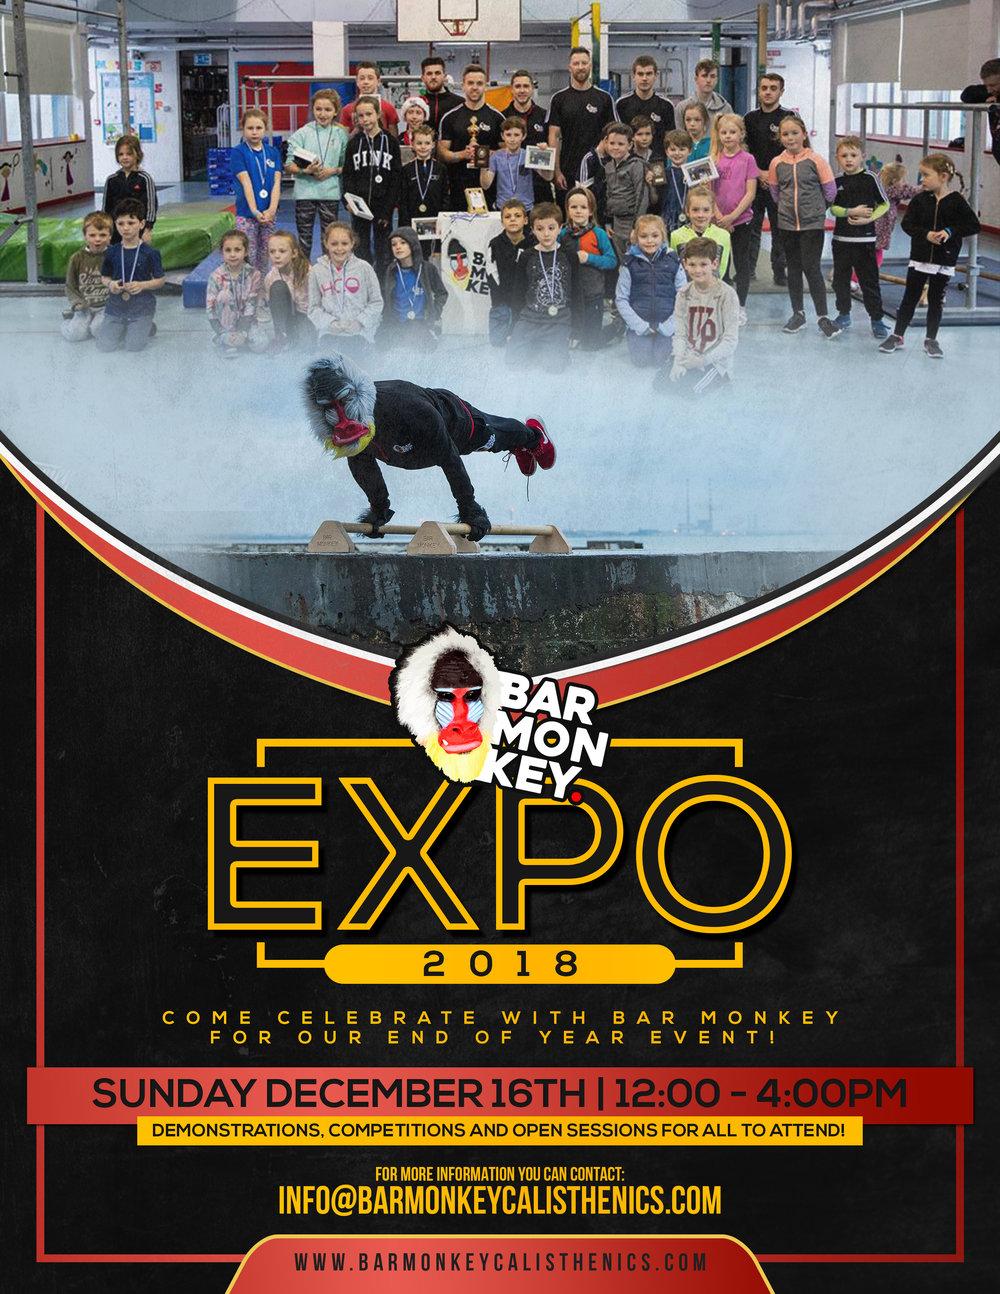 EXPO 2018.jpg